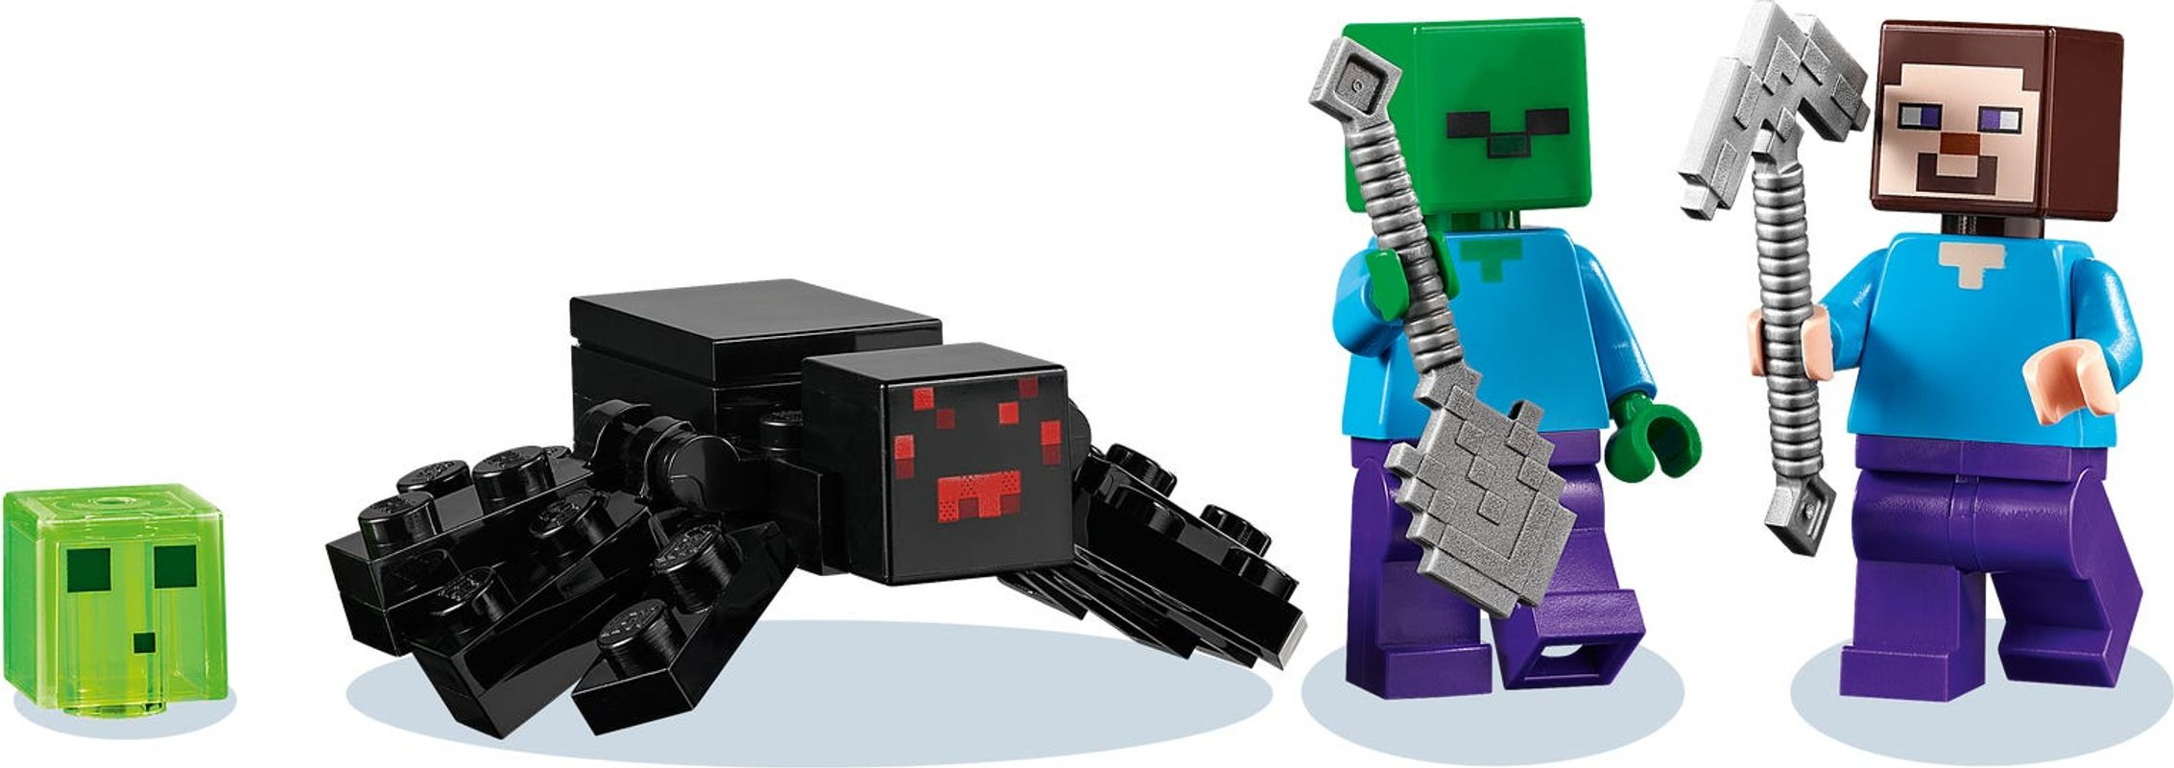 "The ""Abandoned"" Mine minifigures"